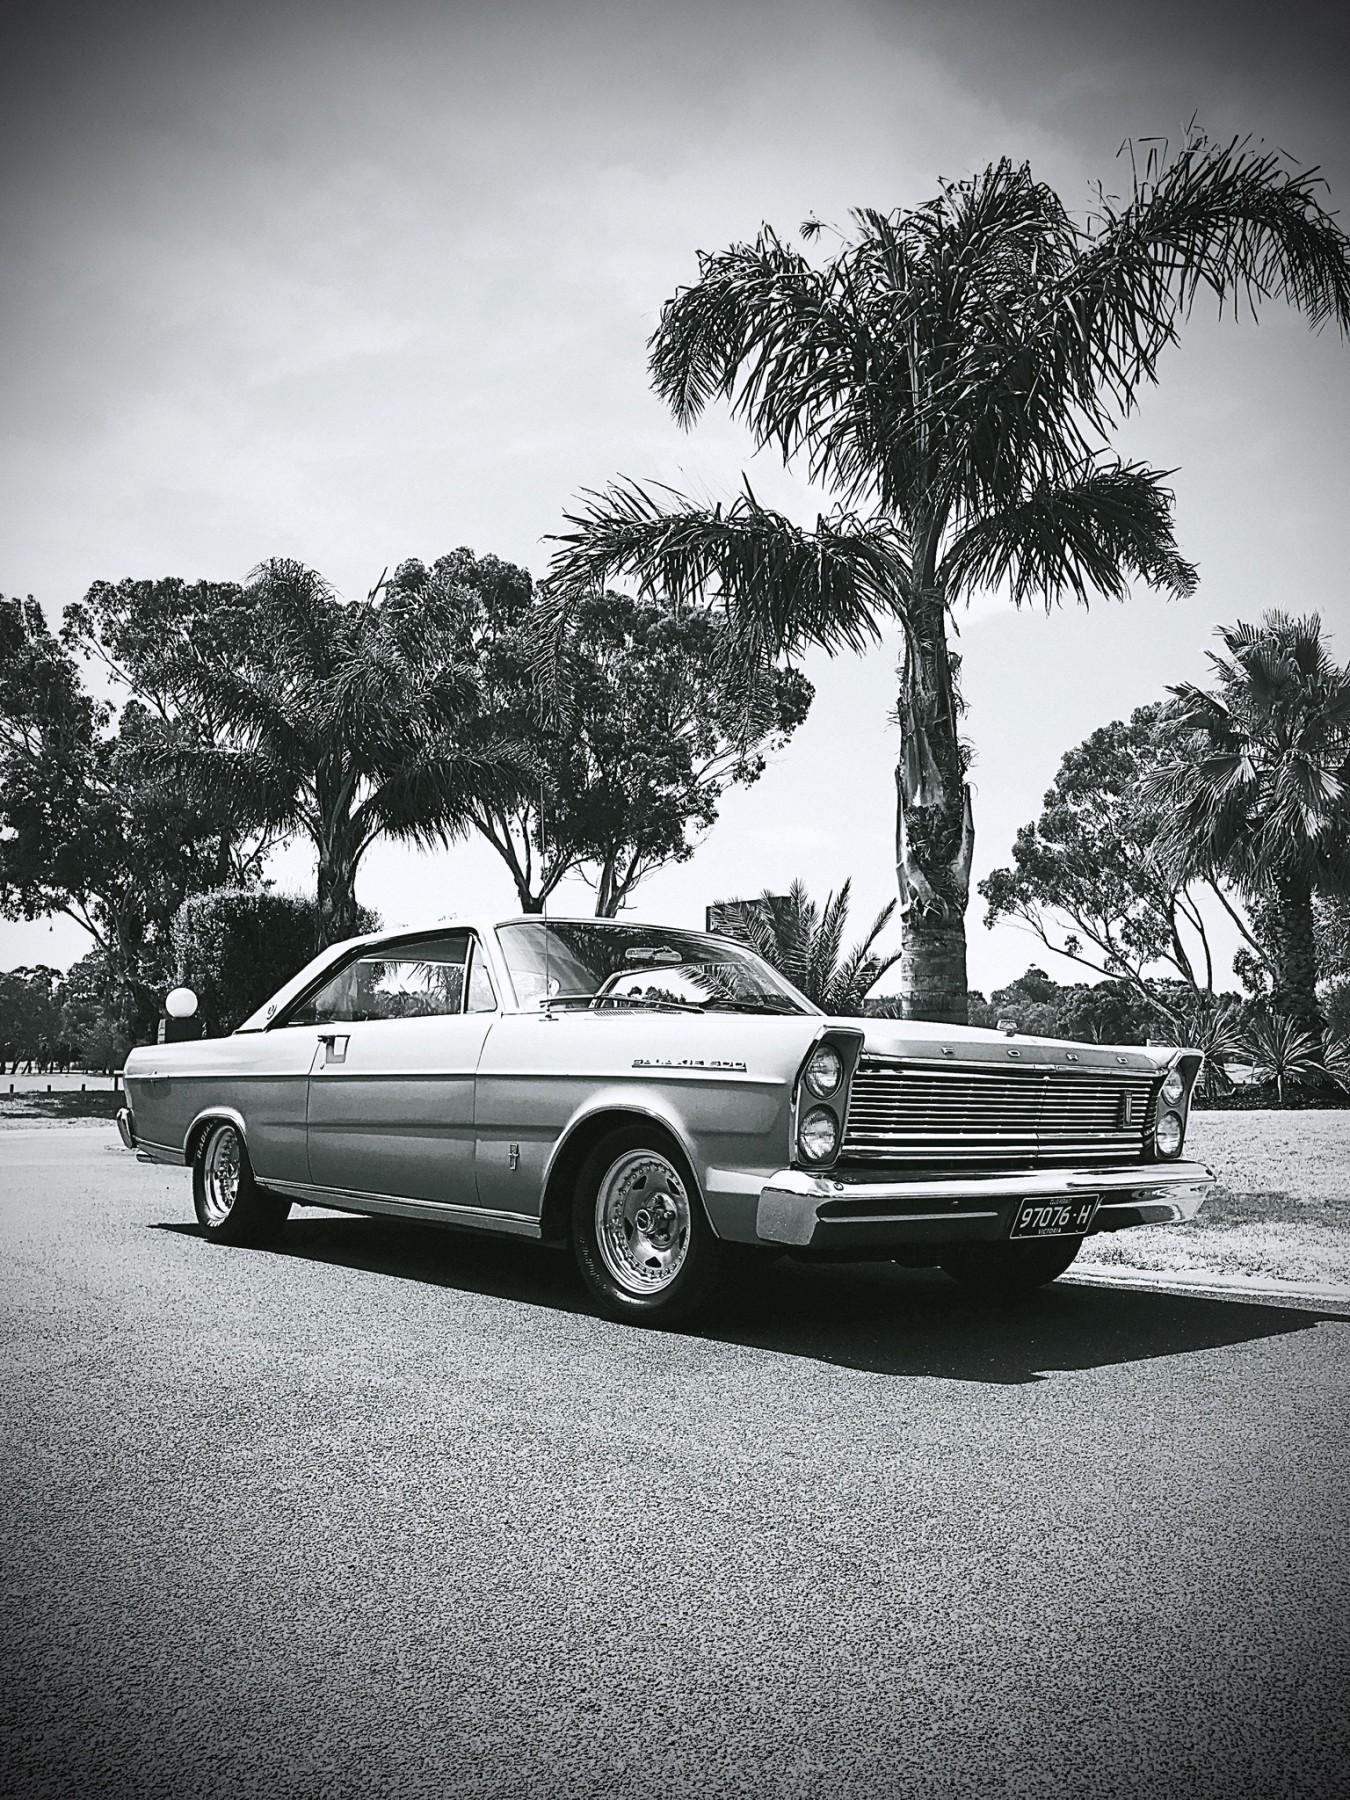 1965 Ford Galaxie 500 LTD